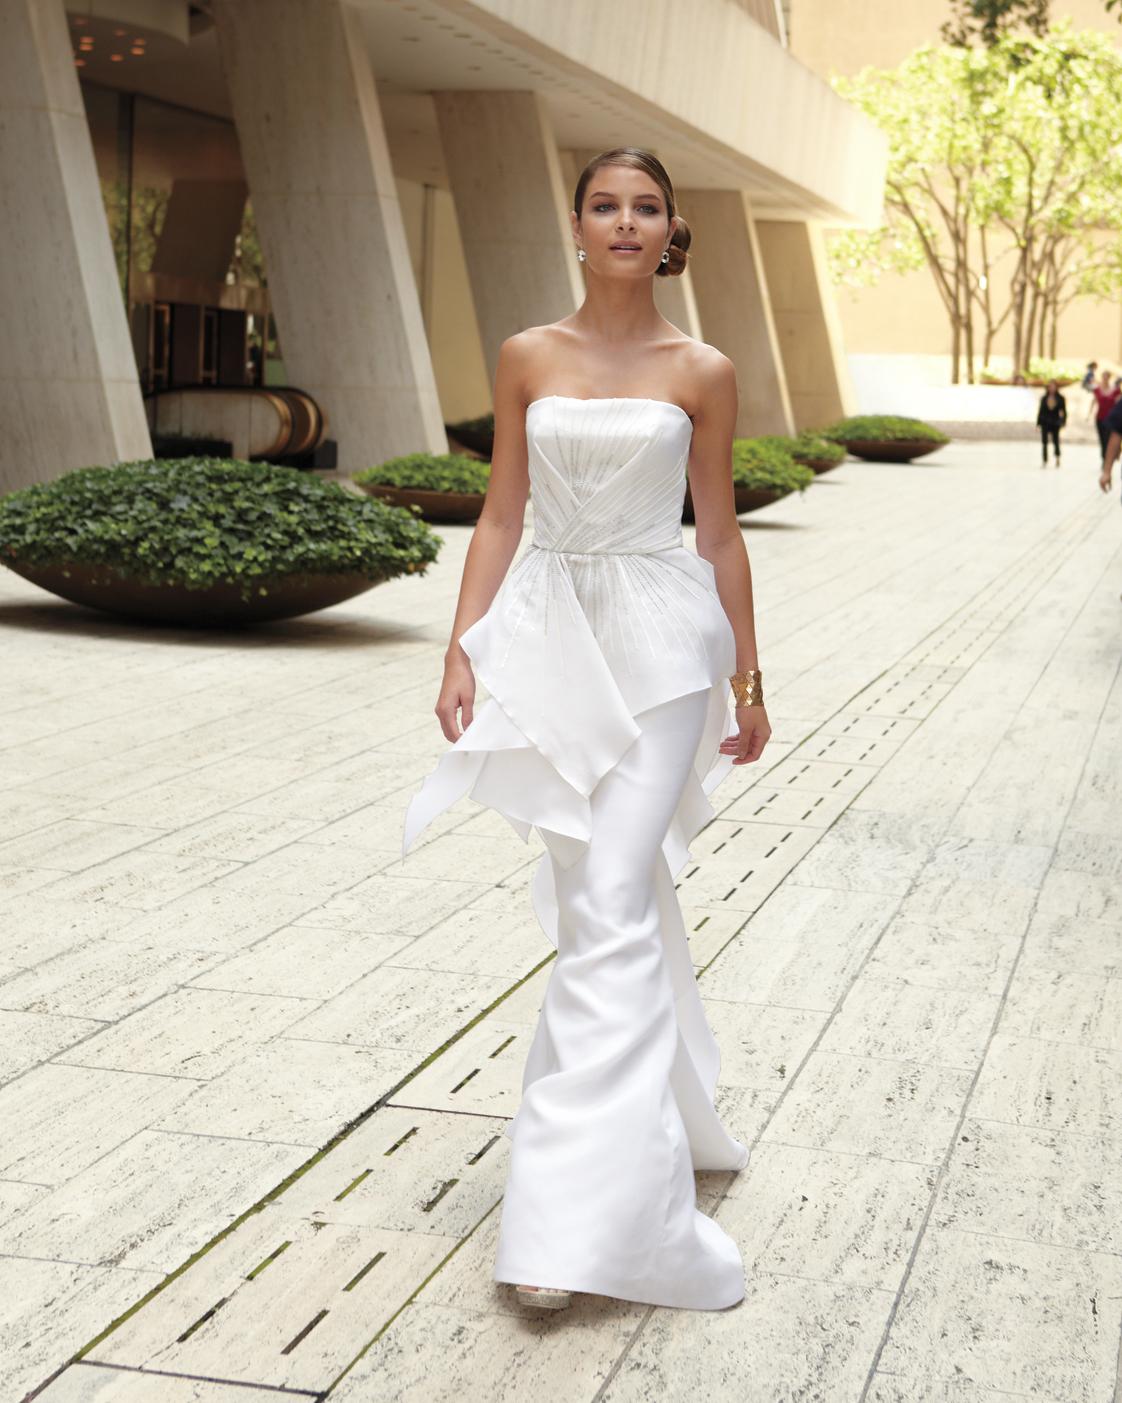 fashion-angelsanchez-4776-md108970.jpg